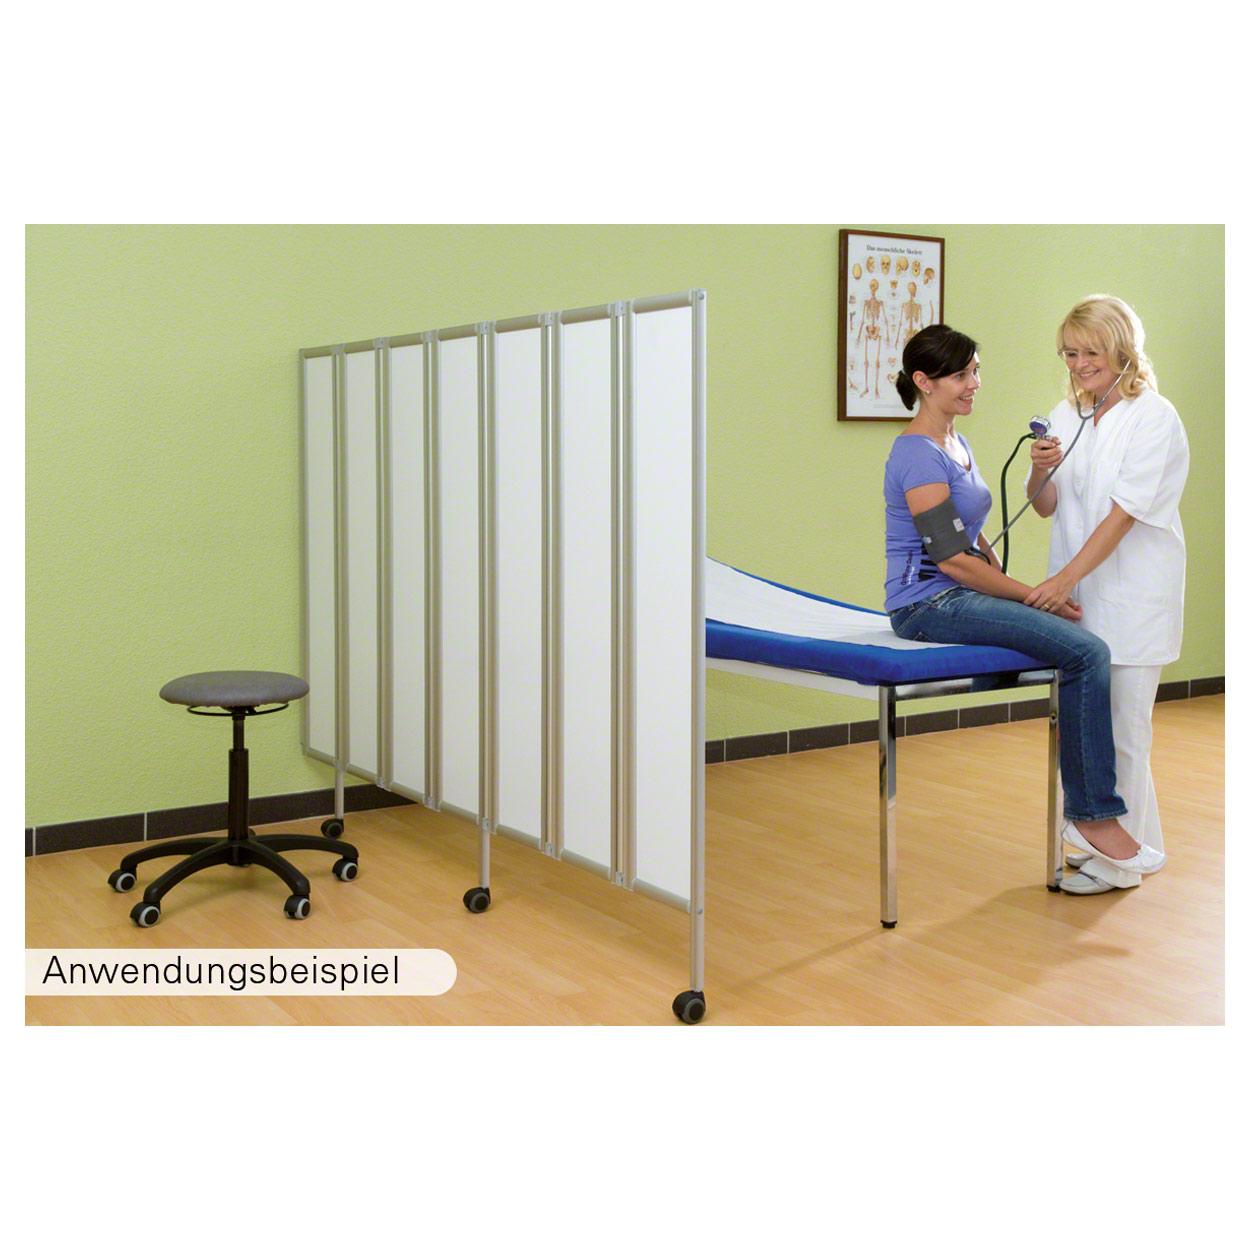 Flexible faltwand raumteiler sichtschutz therapie praxis - Fenster 2 flugelig ...